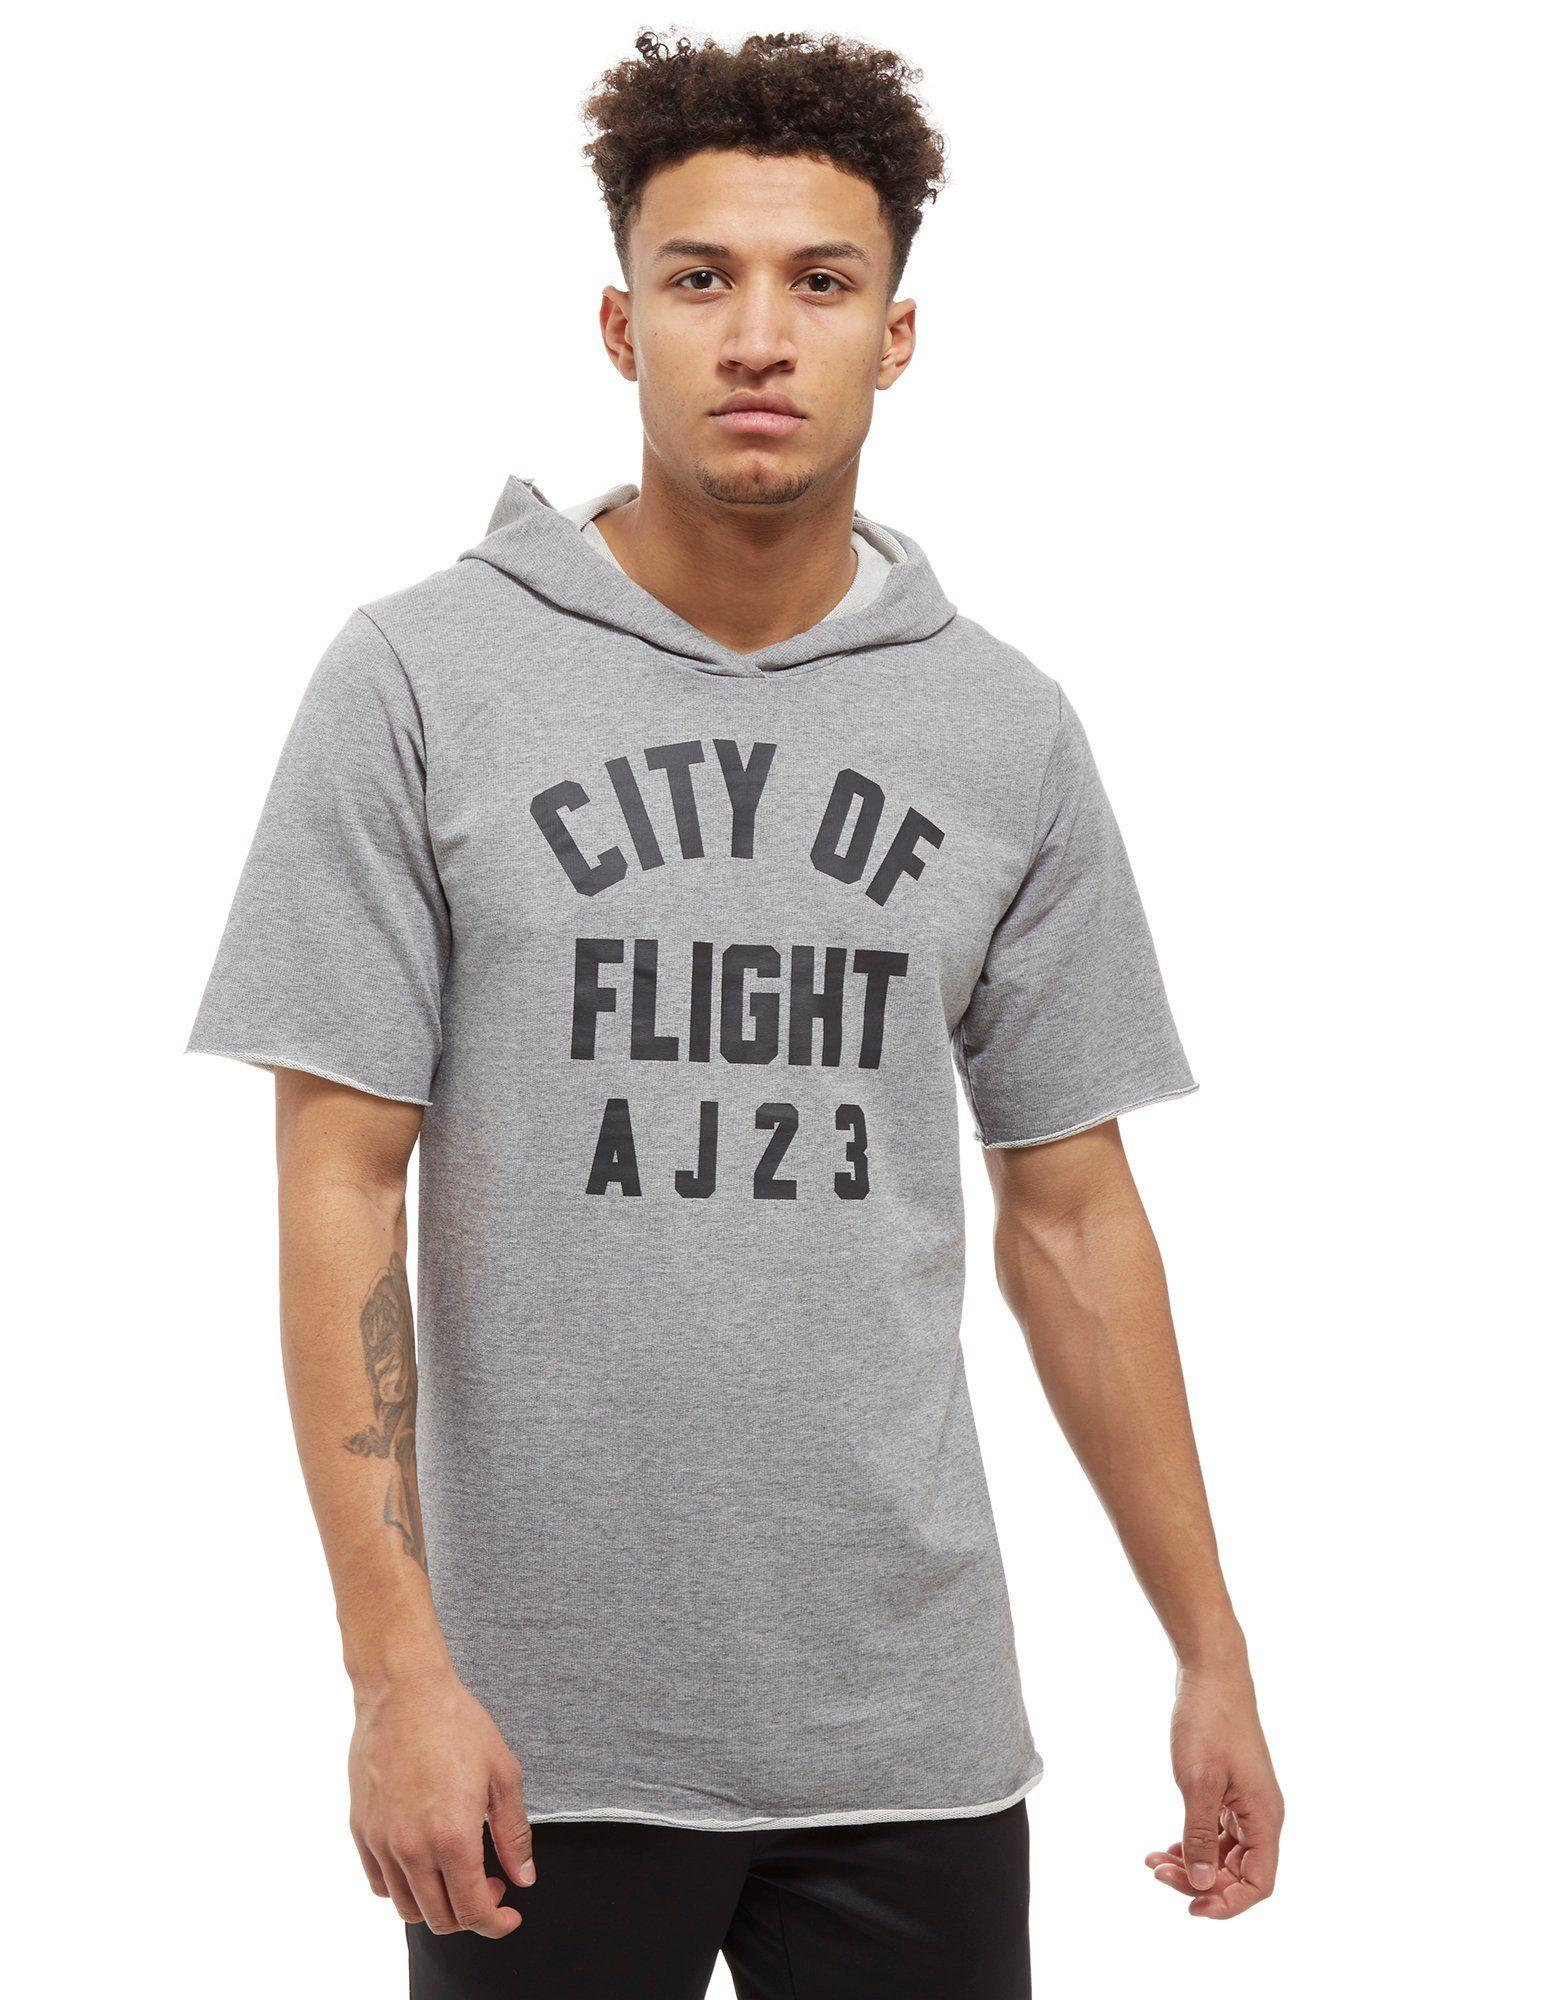 c9a520a70d556e Jordan Sportswear  Jordan City of Flight Short Sleeve Hooded Top JD Sports  ...